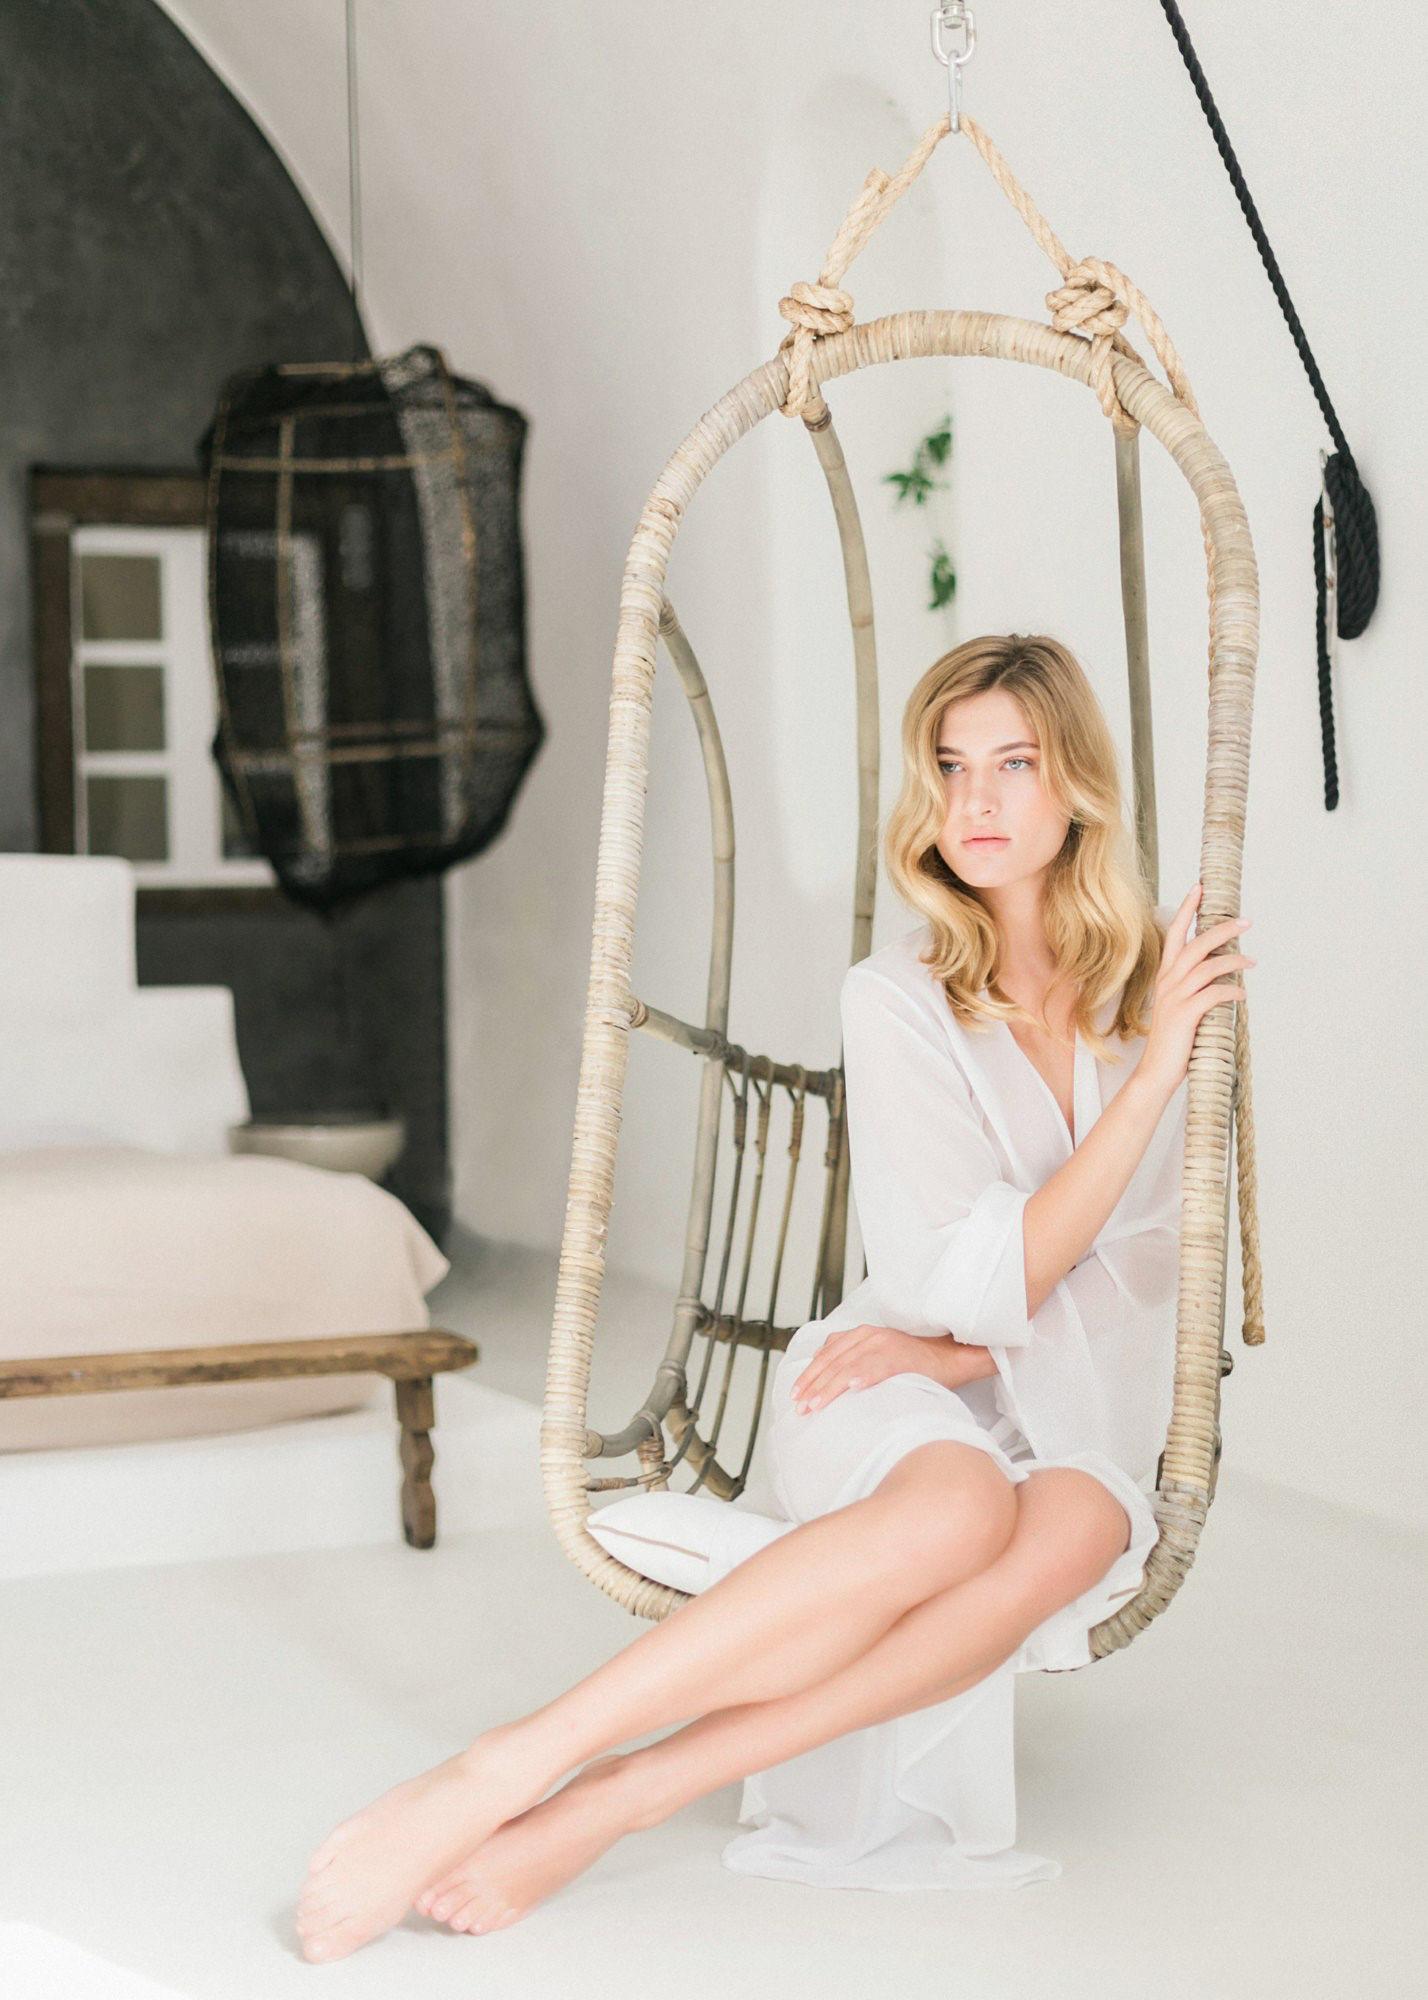 Bridal Boudoir | Boheme Workshop | Sandy and Odysseas Photography | Joy Wed blog | http://www.joy-wed.com